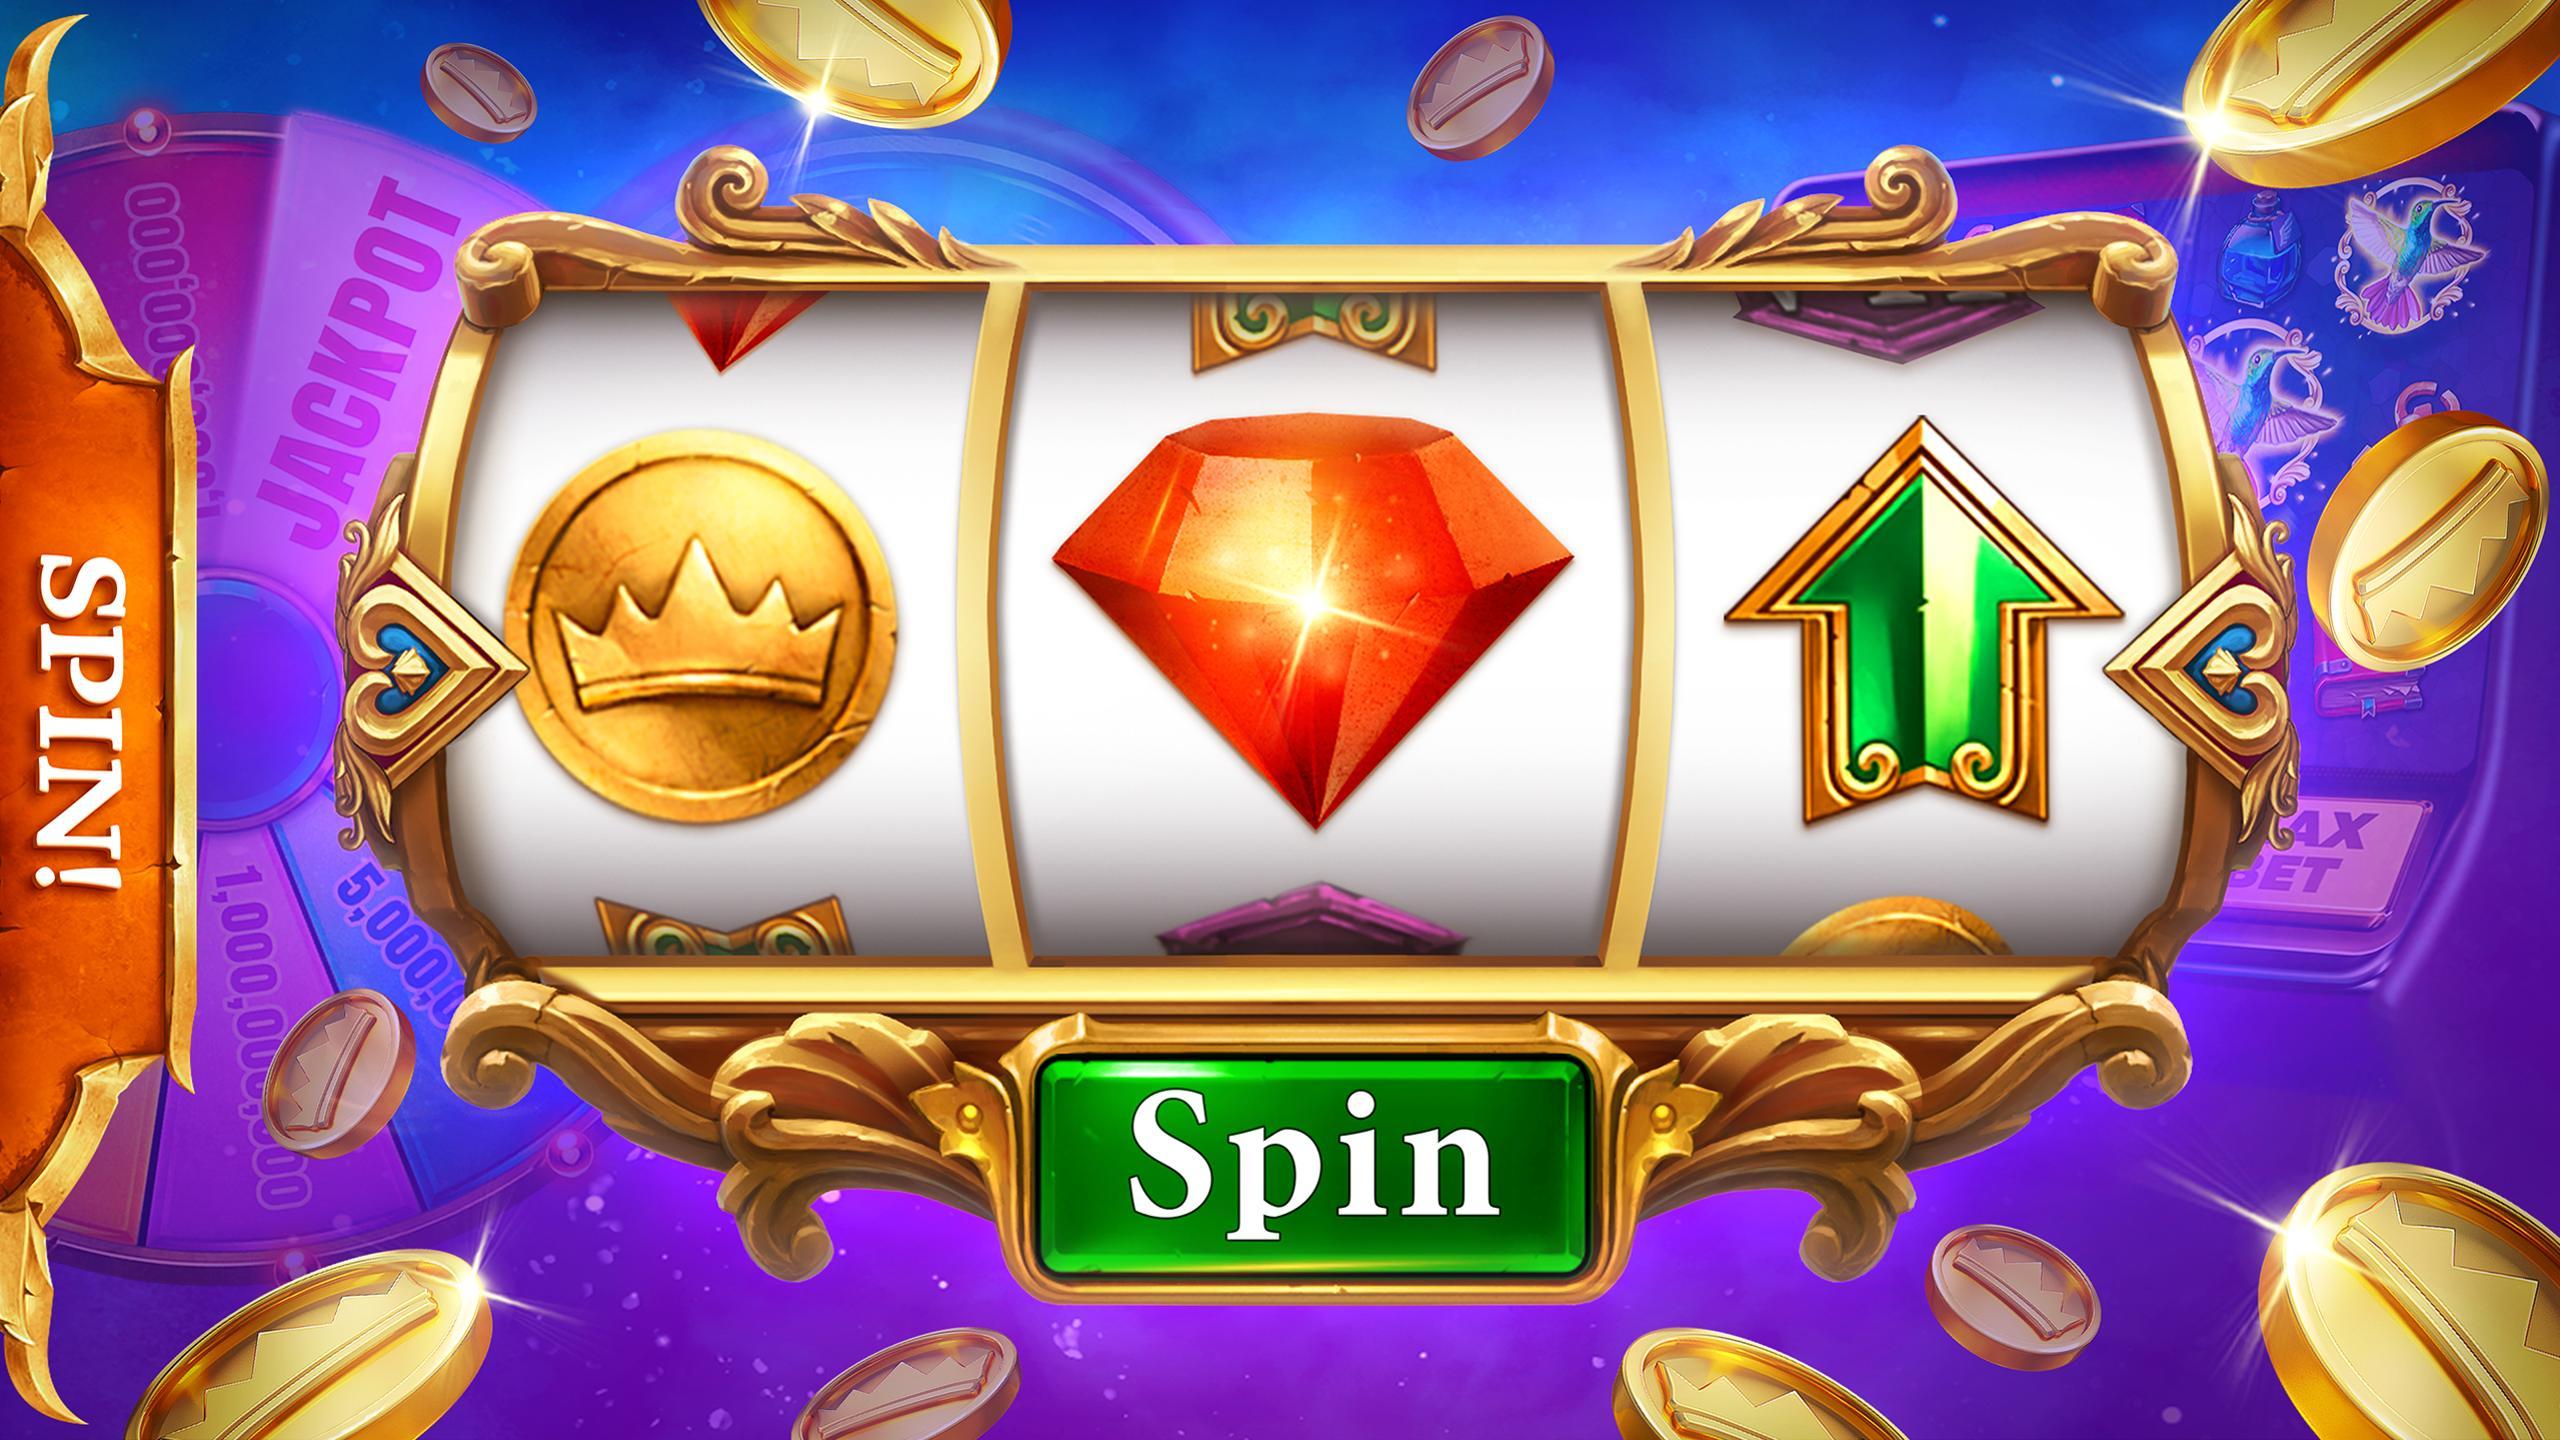 Scatter Slots Las Vegas Casino Game 777 Online 3.87.0 Screenshot 1